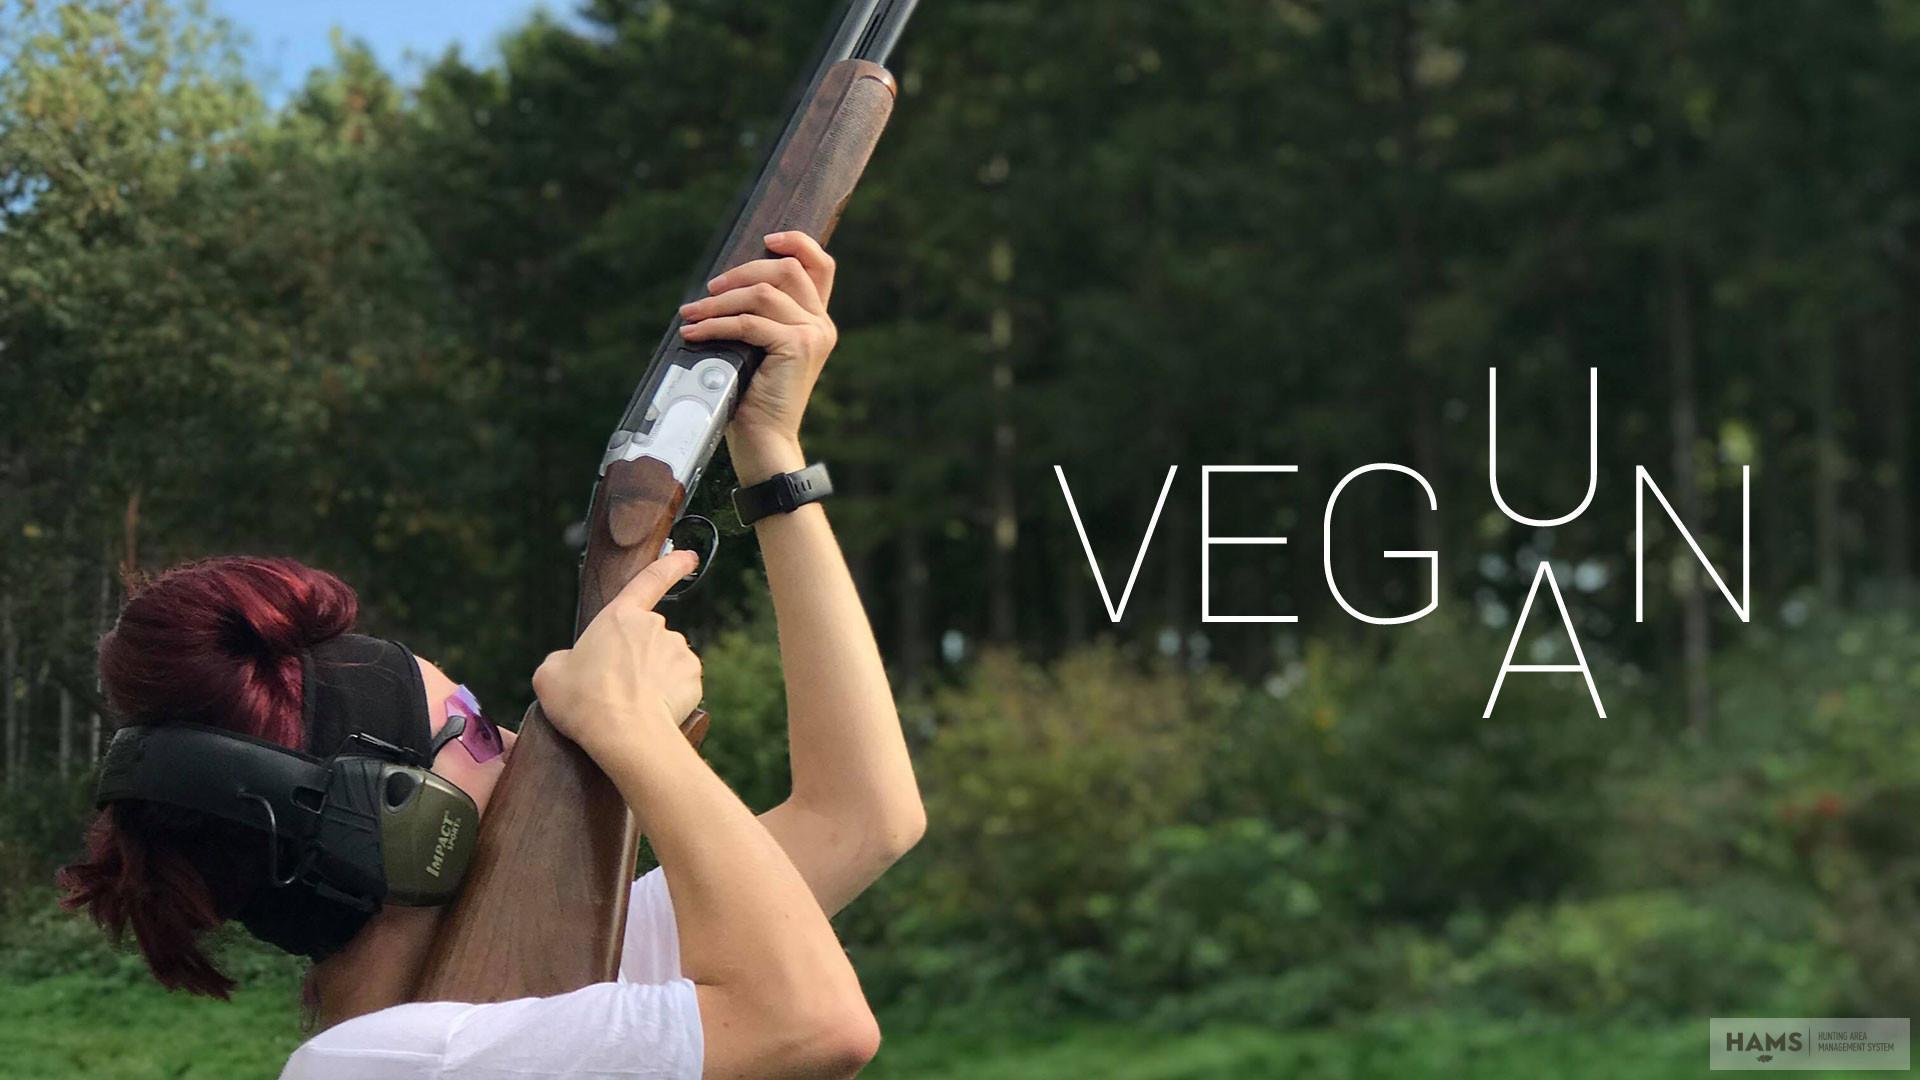 A vegan's view...